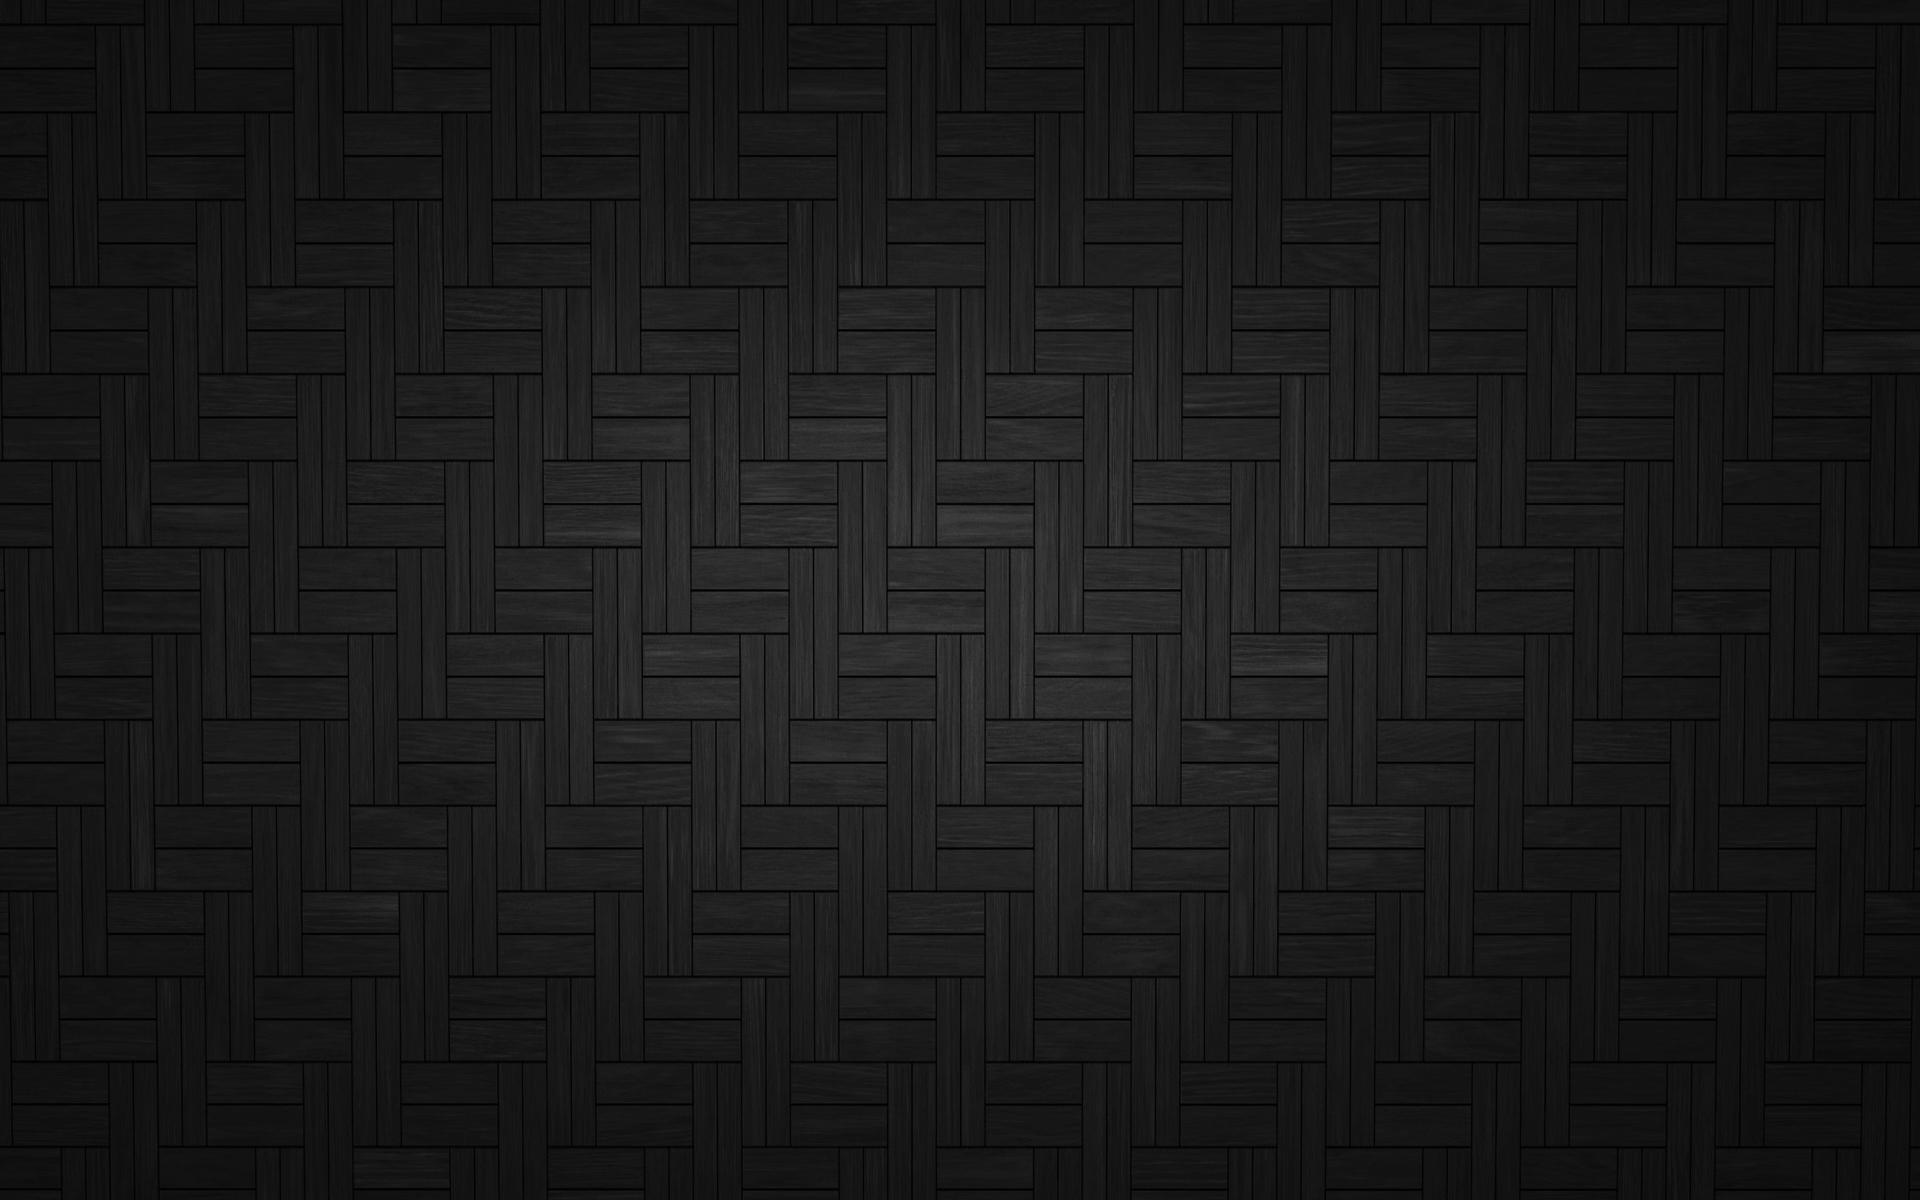 HD Black Backgrounds 6940464 1920x1200